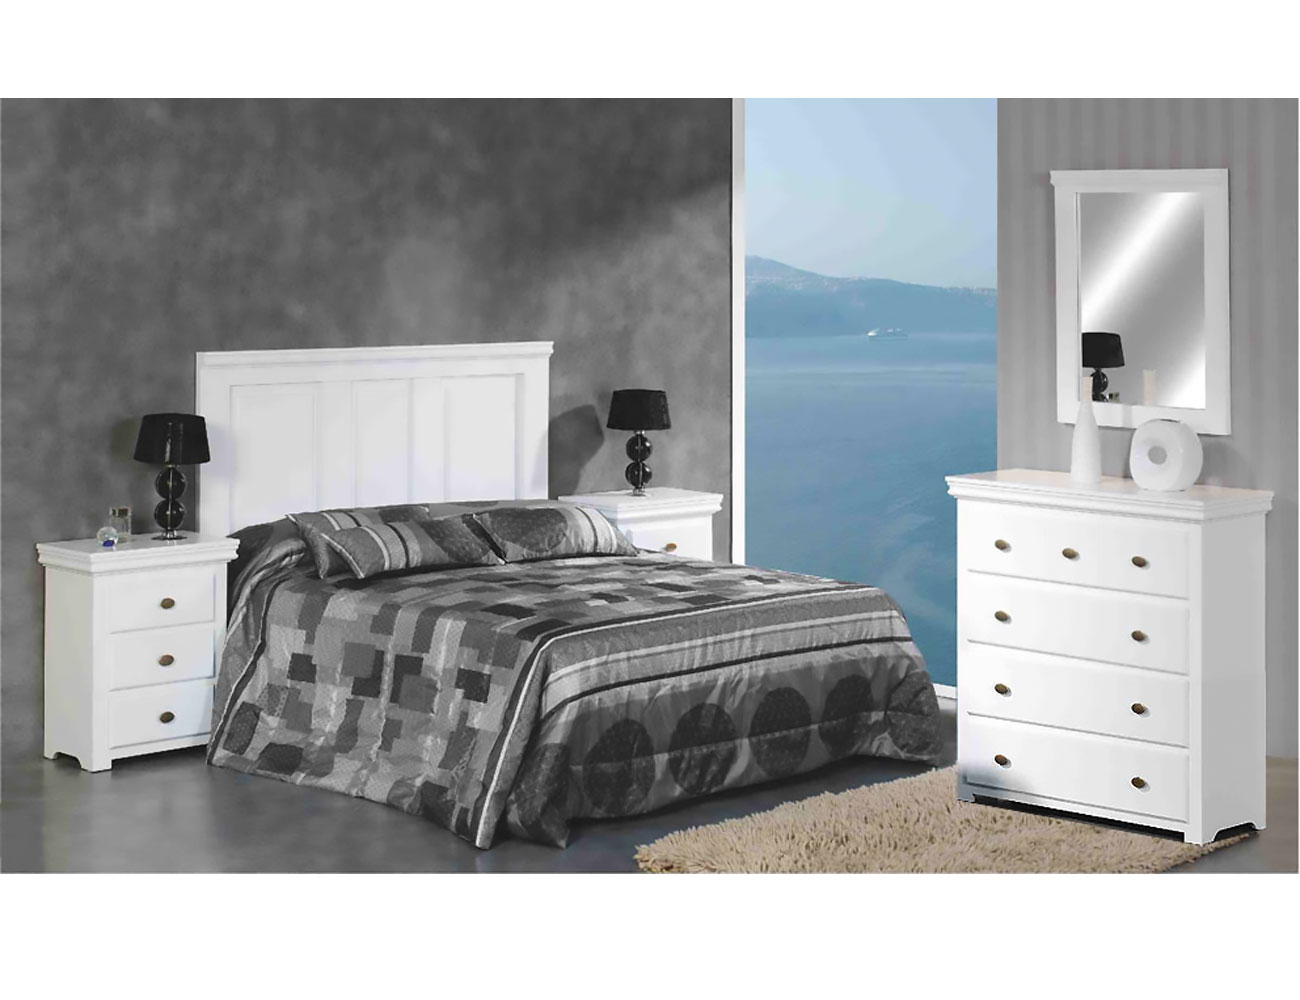 Dormitorio matrimonio comoda 5 c madera dm lacado blanco3